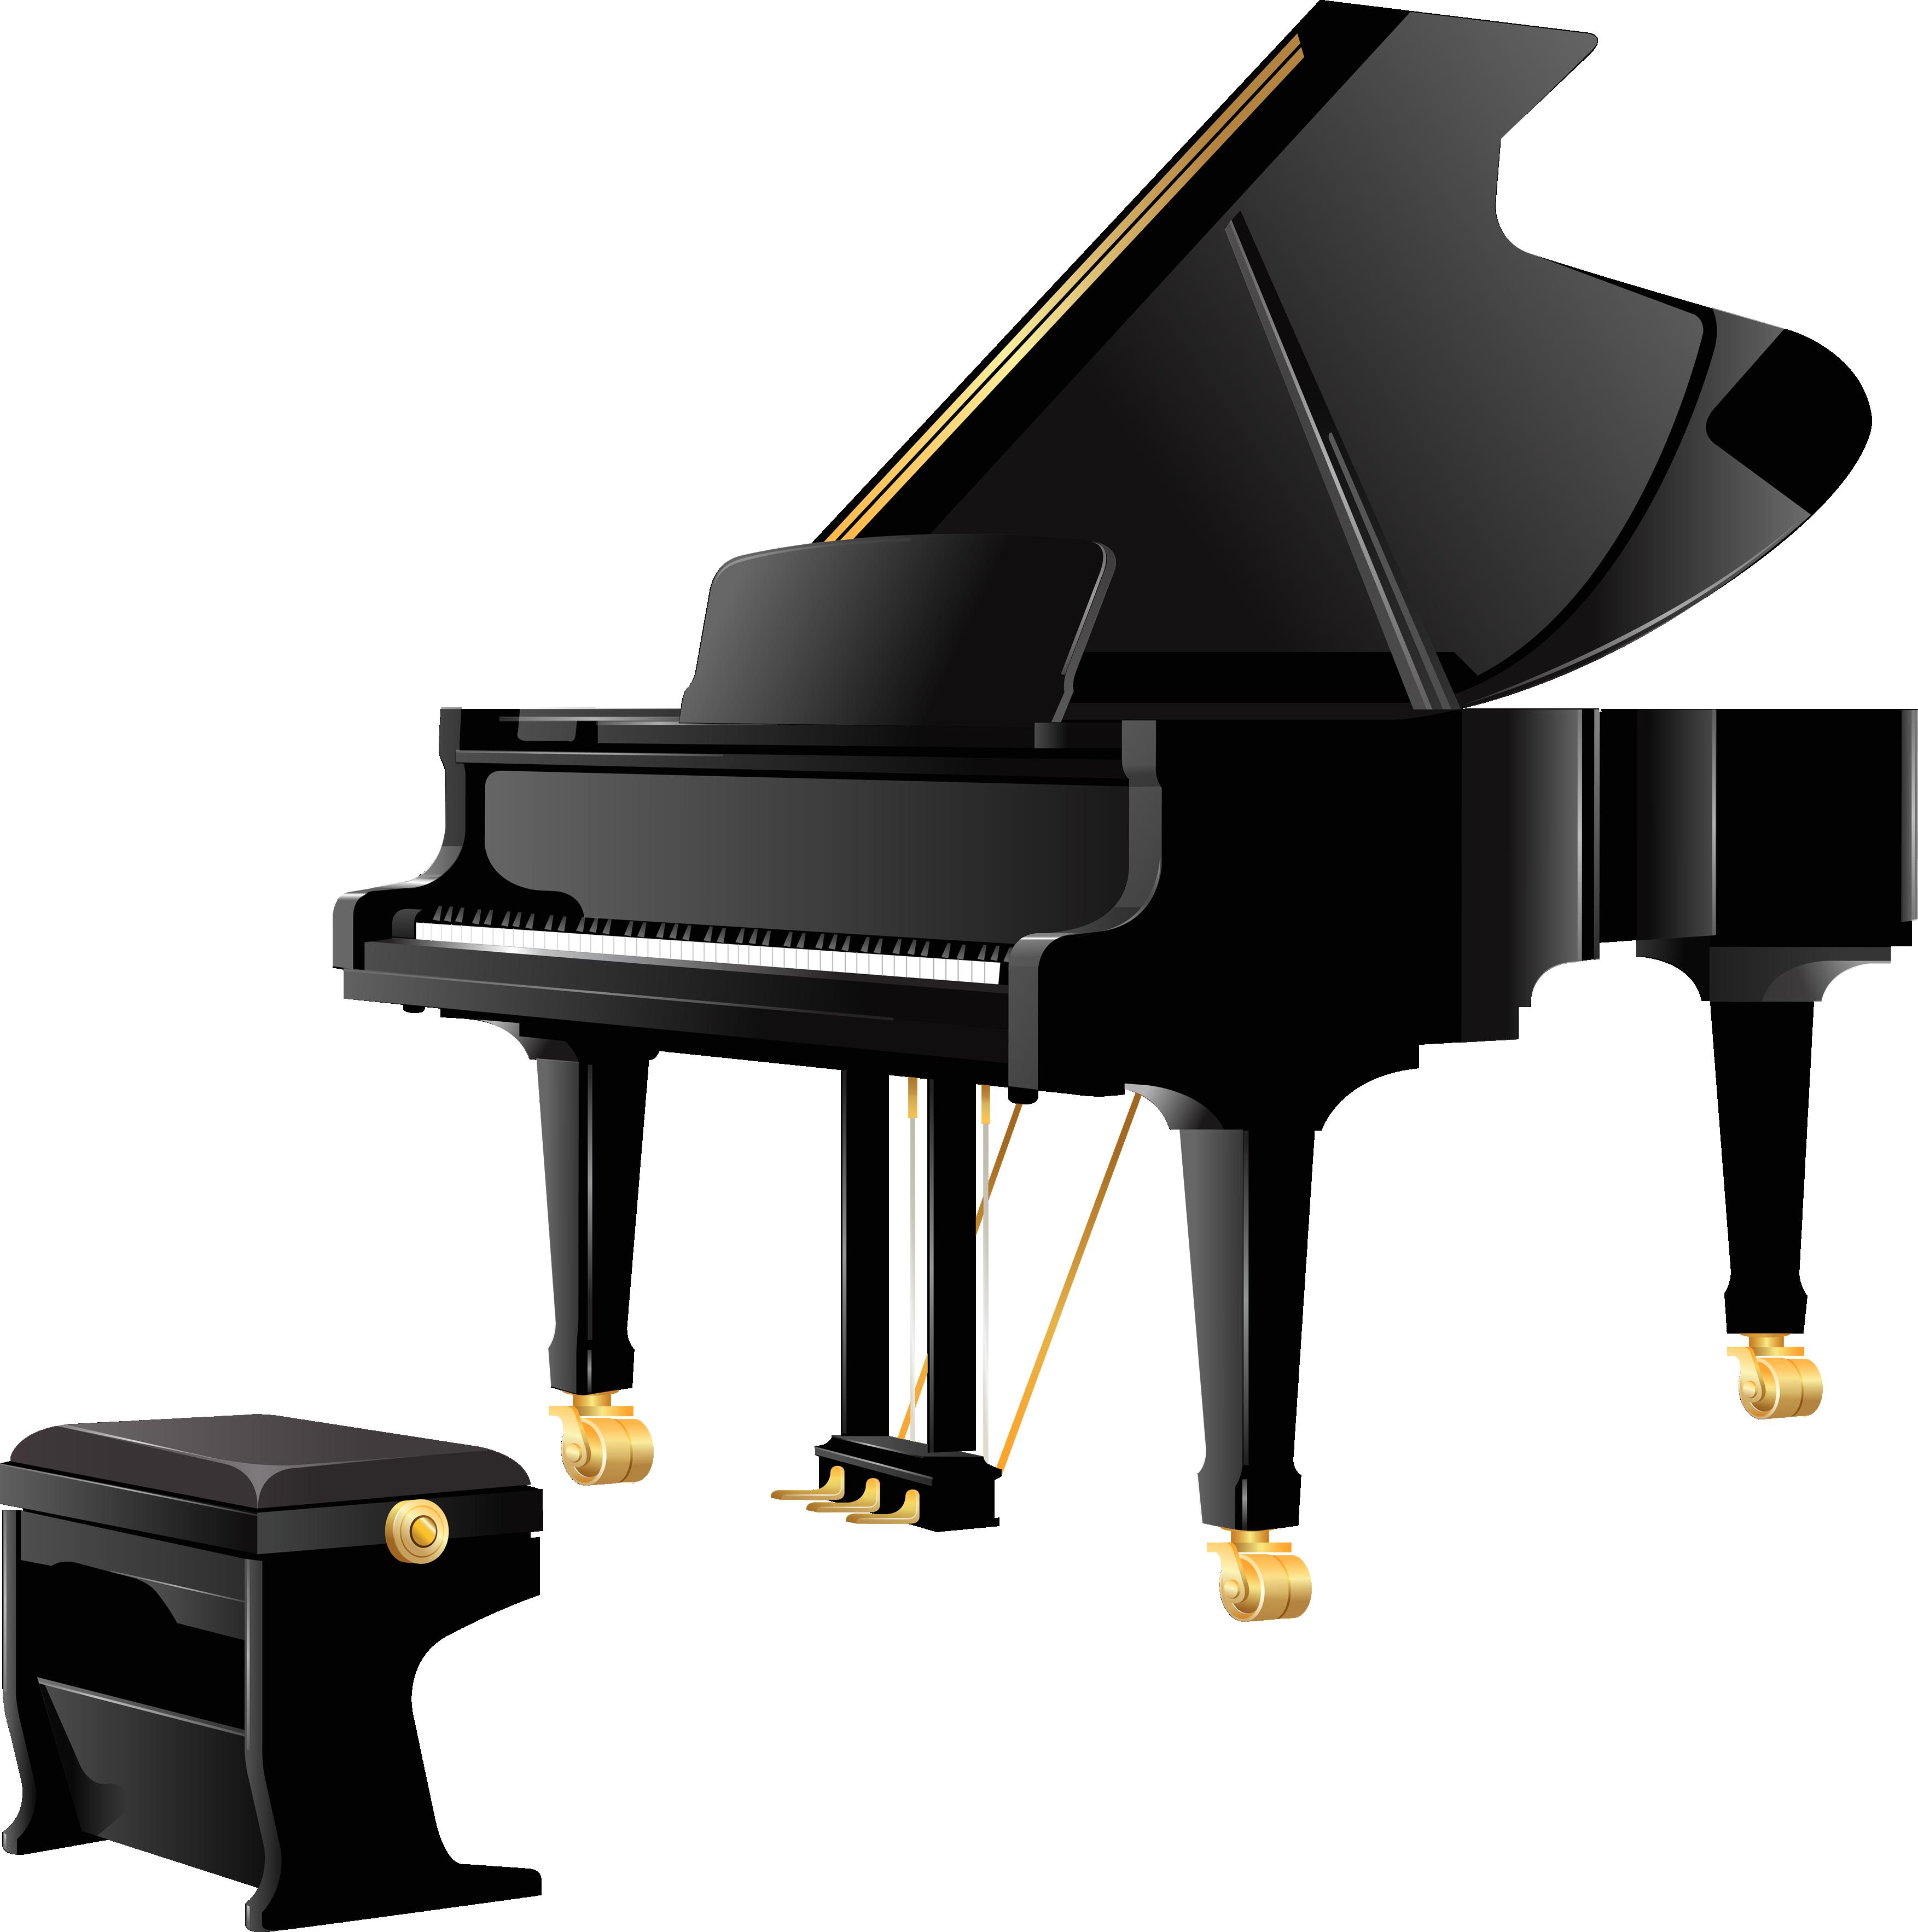 Piano Png Image Piano Grand Piano Clip Art